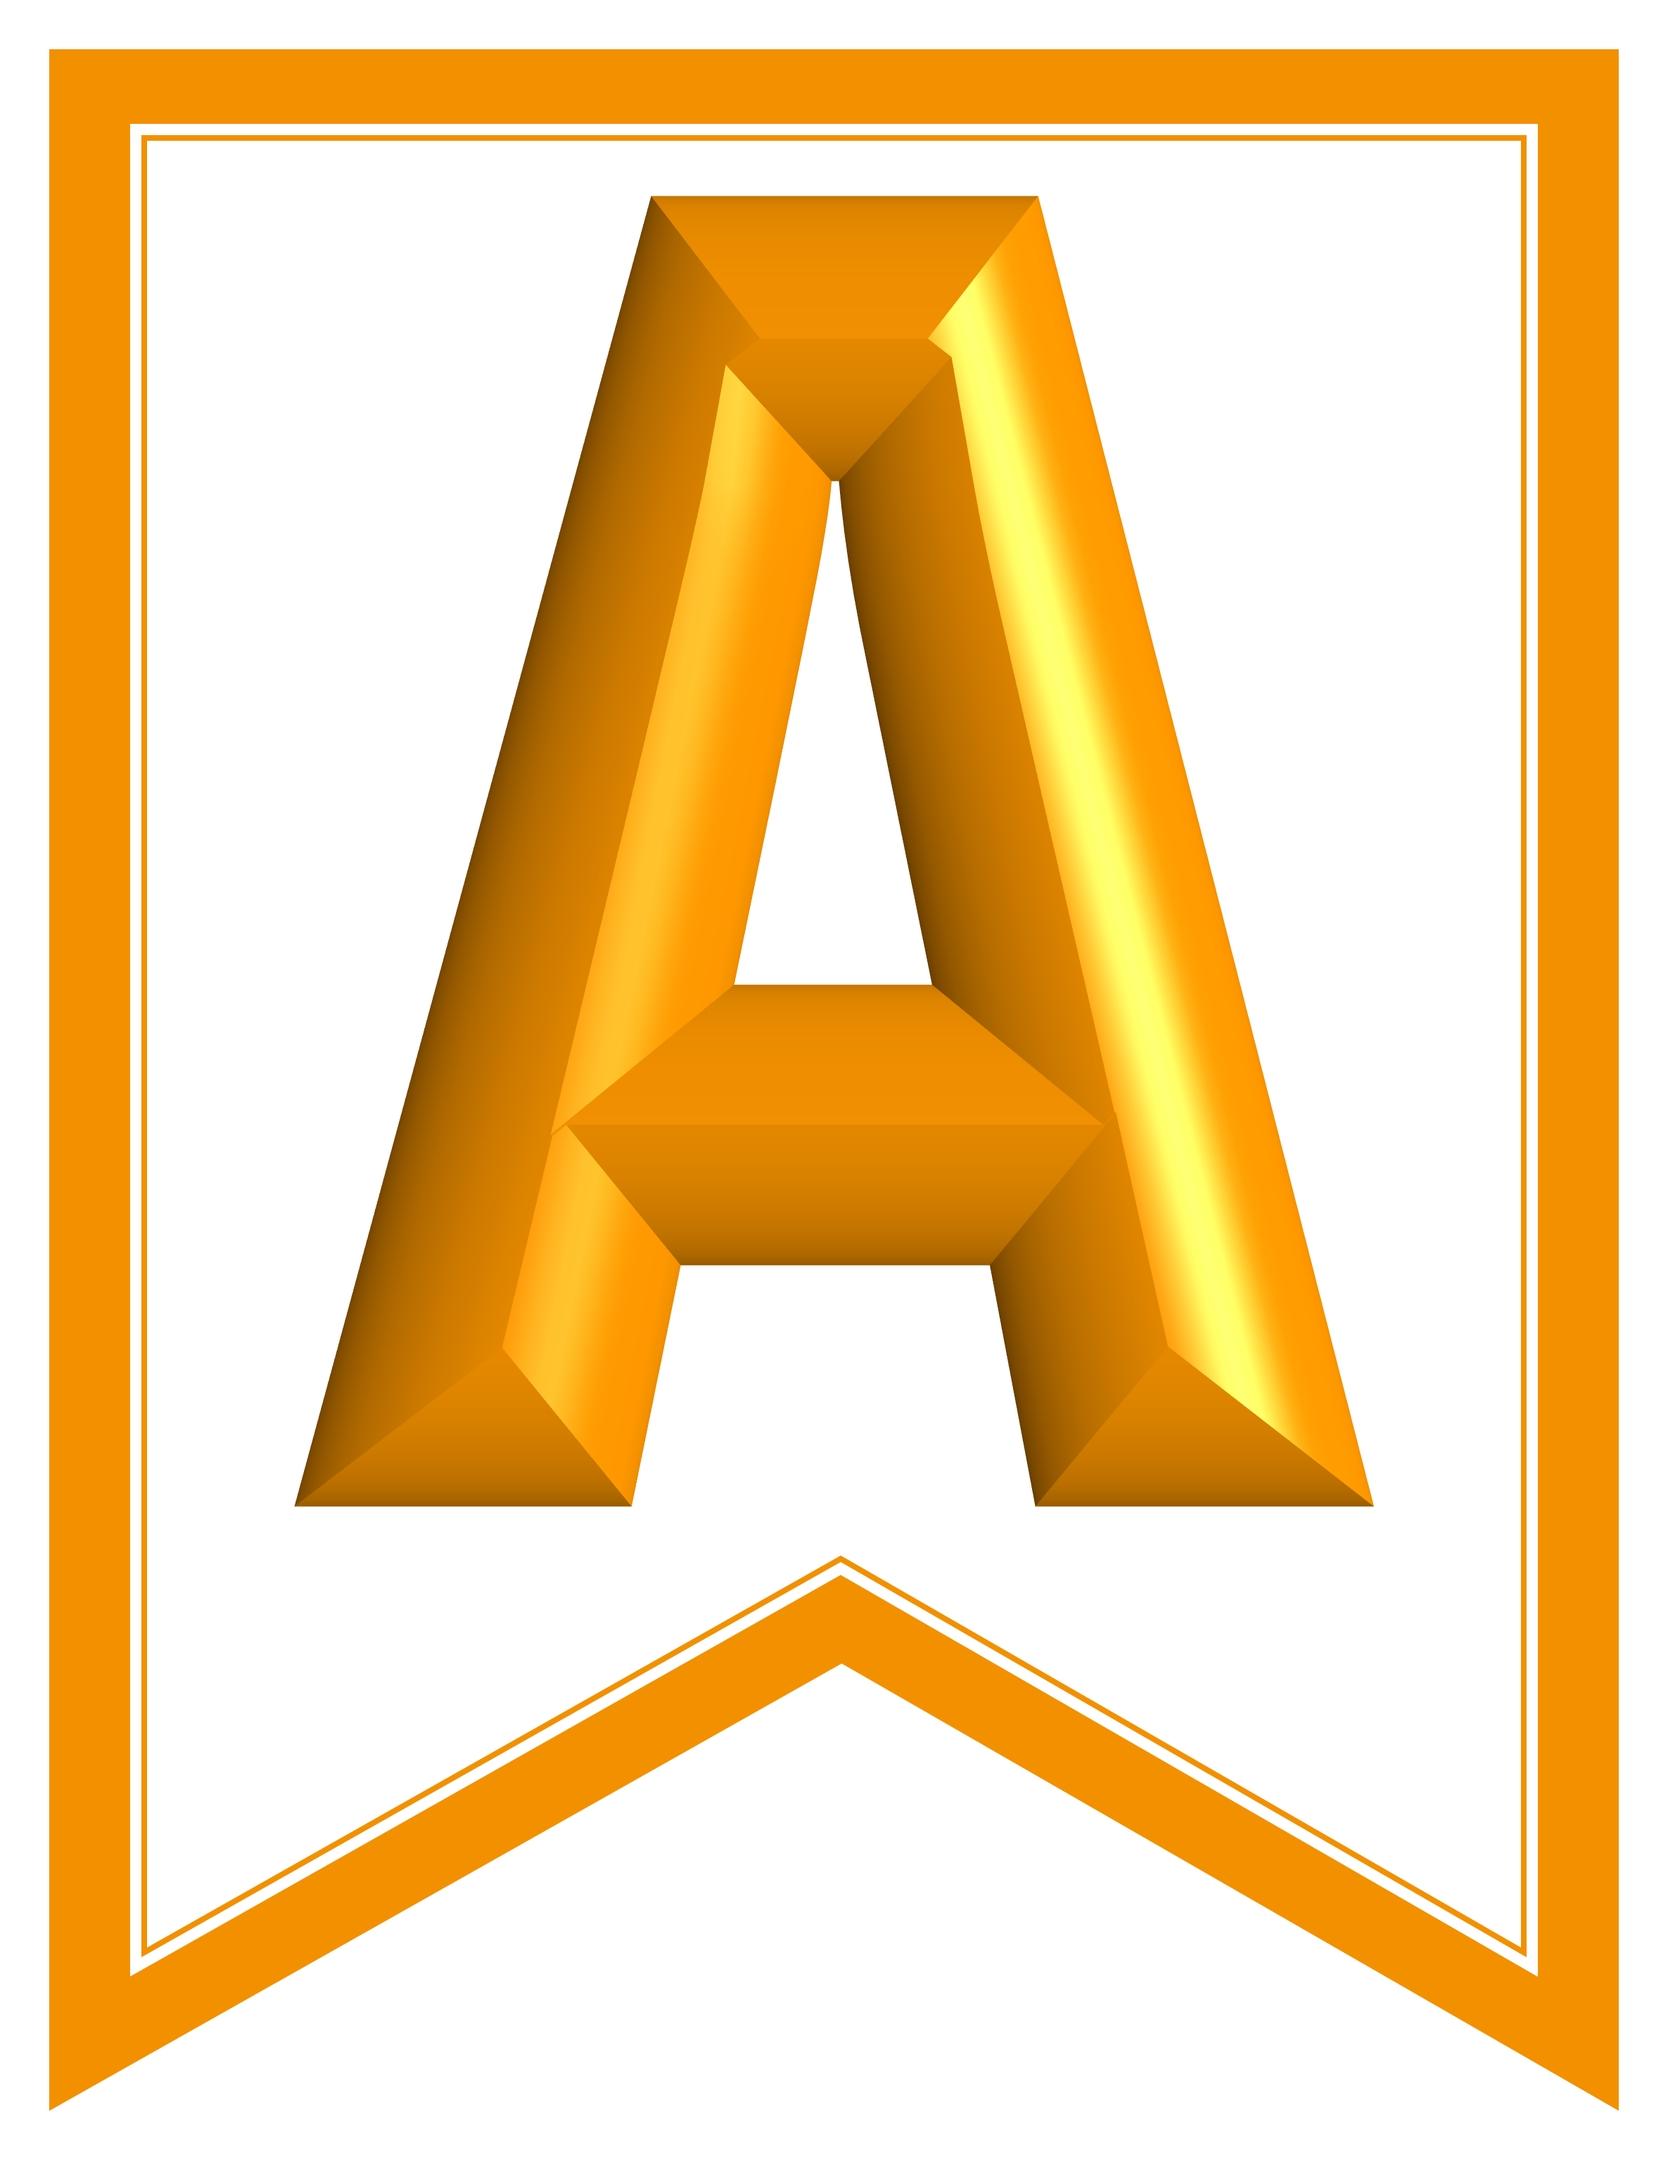 photograph relating to Printable Alphabet Banner identified as SWALLOWTAIL-PRINTABLE-ALPHABET-BANNER-LETTERS-orange-white